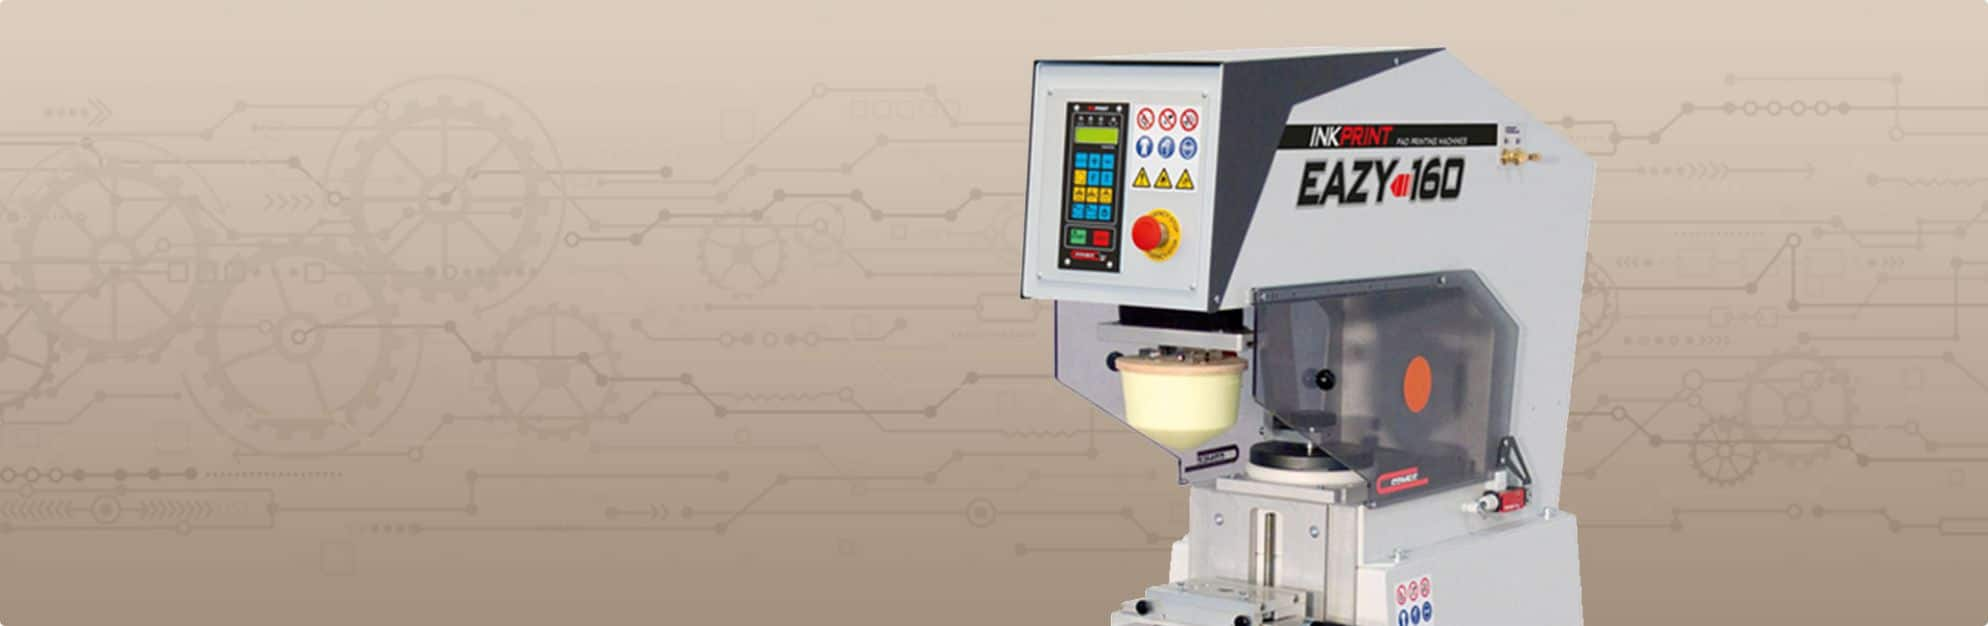 The EAZY 160 Pad Printing Machine